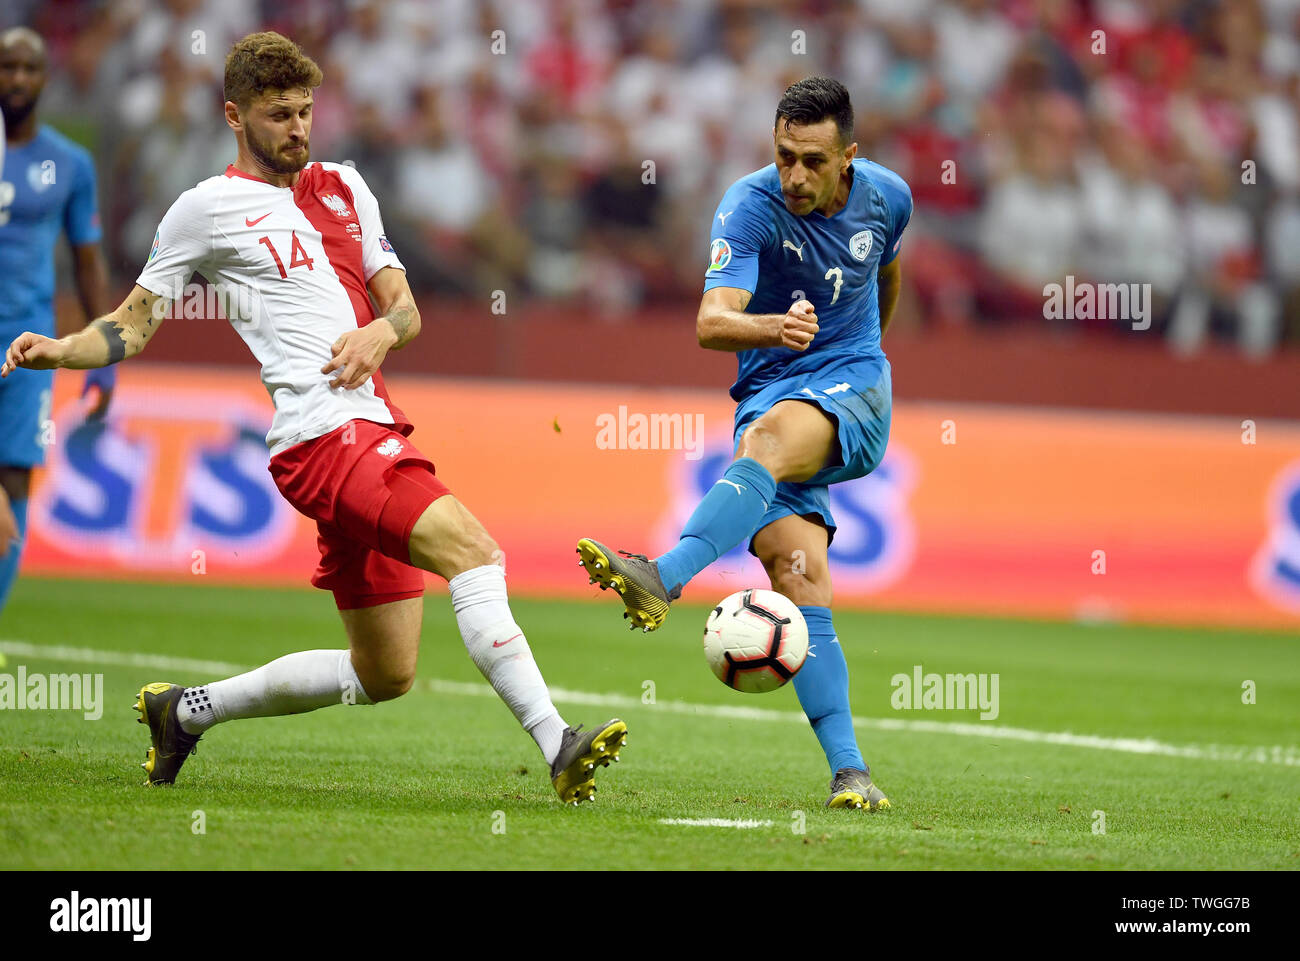 Warsaw, Poland, June 10, 2019: EURO 2020 qualifing round, group stage, Poland wins 4:0 with Izarel on PGE Narodowy. Mateusz Klich (Poland) Eran Zahavi (Izrael) - Stock Image